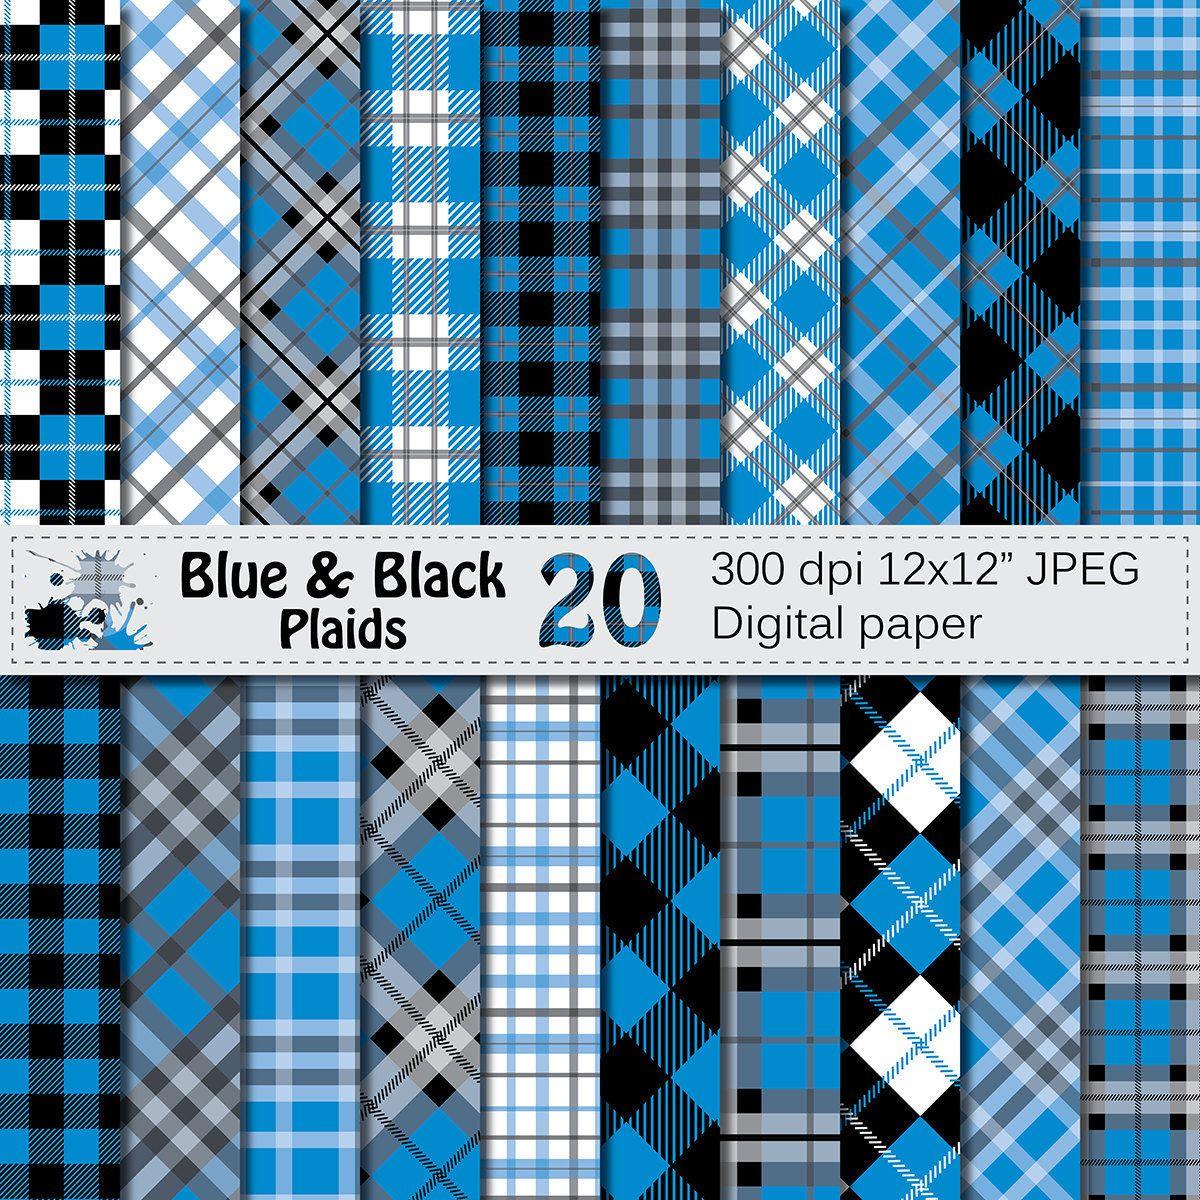 Blue and Black Plaids Digital Paper, Buffalo Plaid